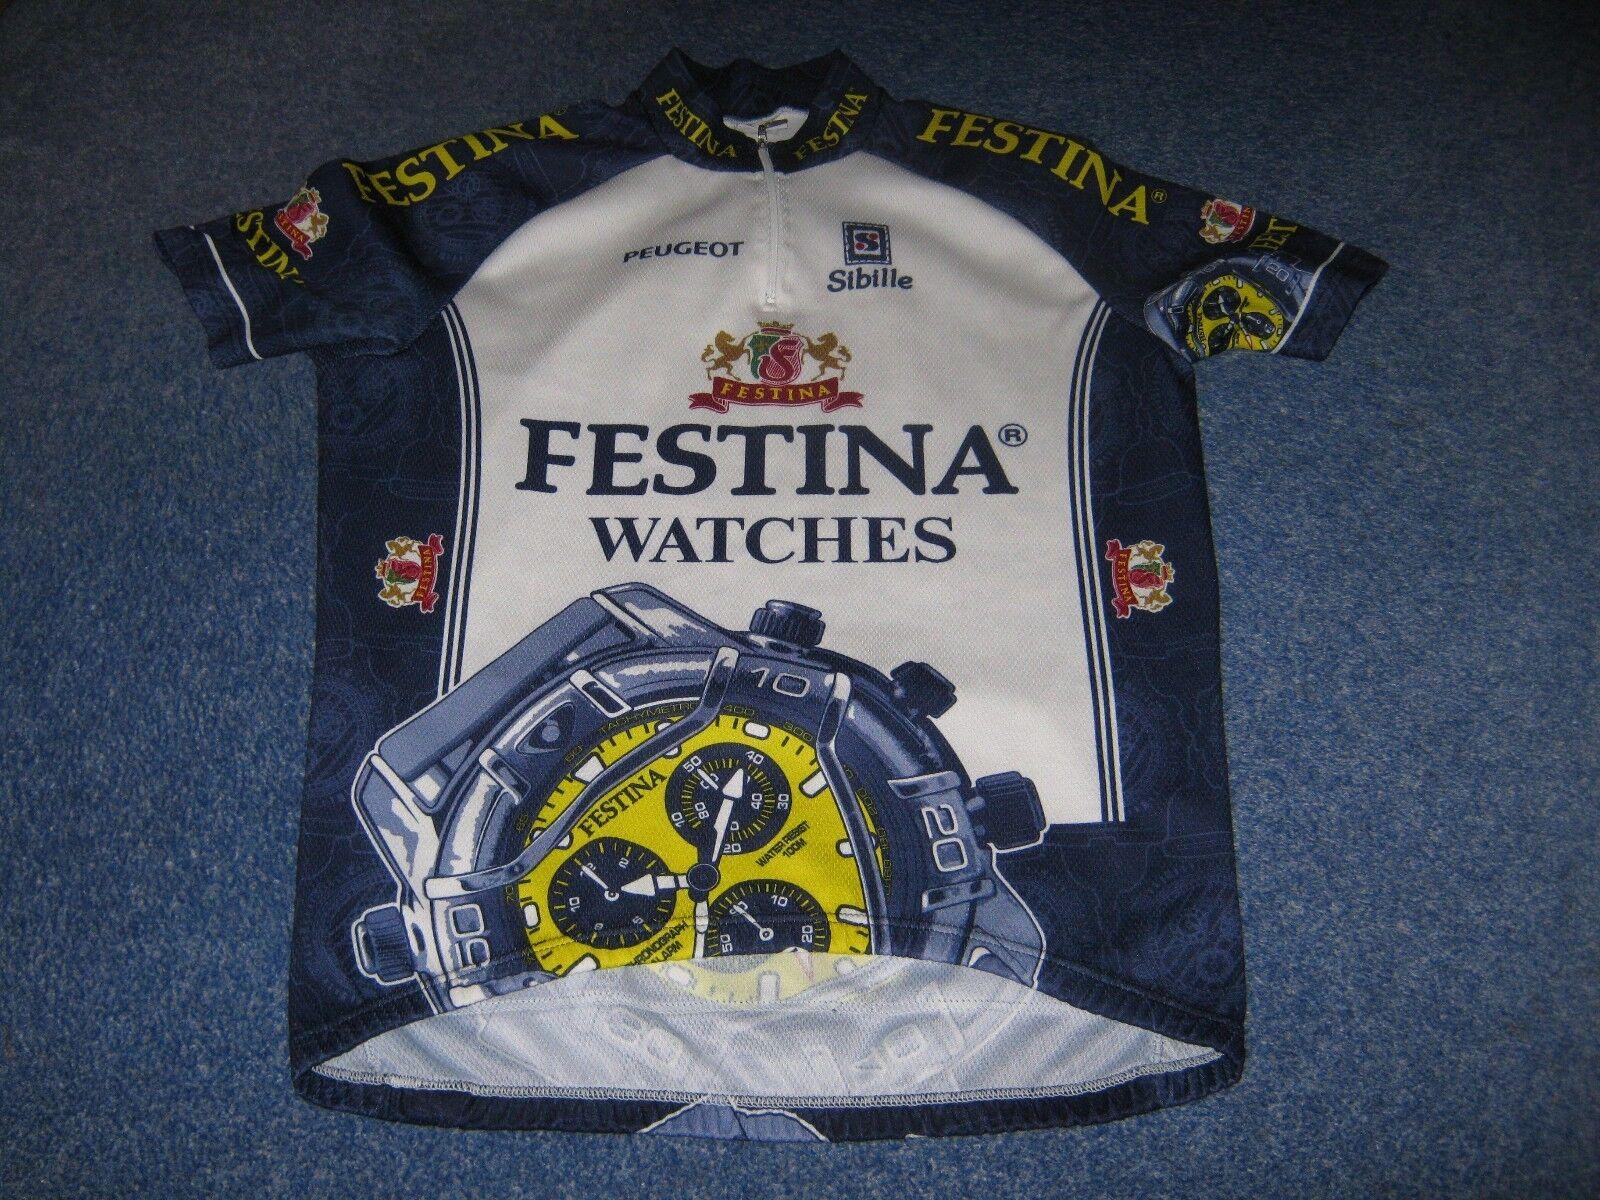 FESTINA WATCHES PEUGEOT SIBILLE ITALIAN CYCLING JERSEY [XXL]